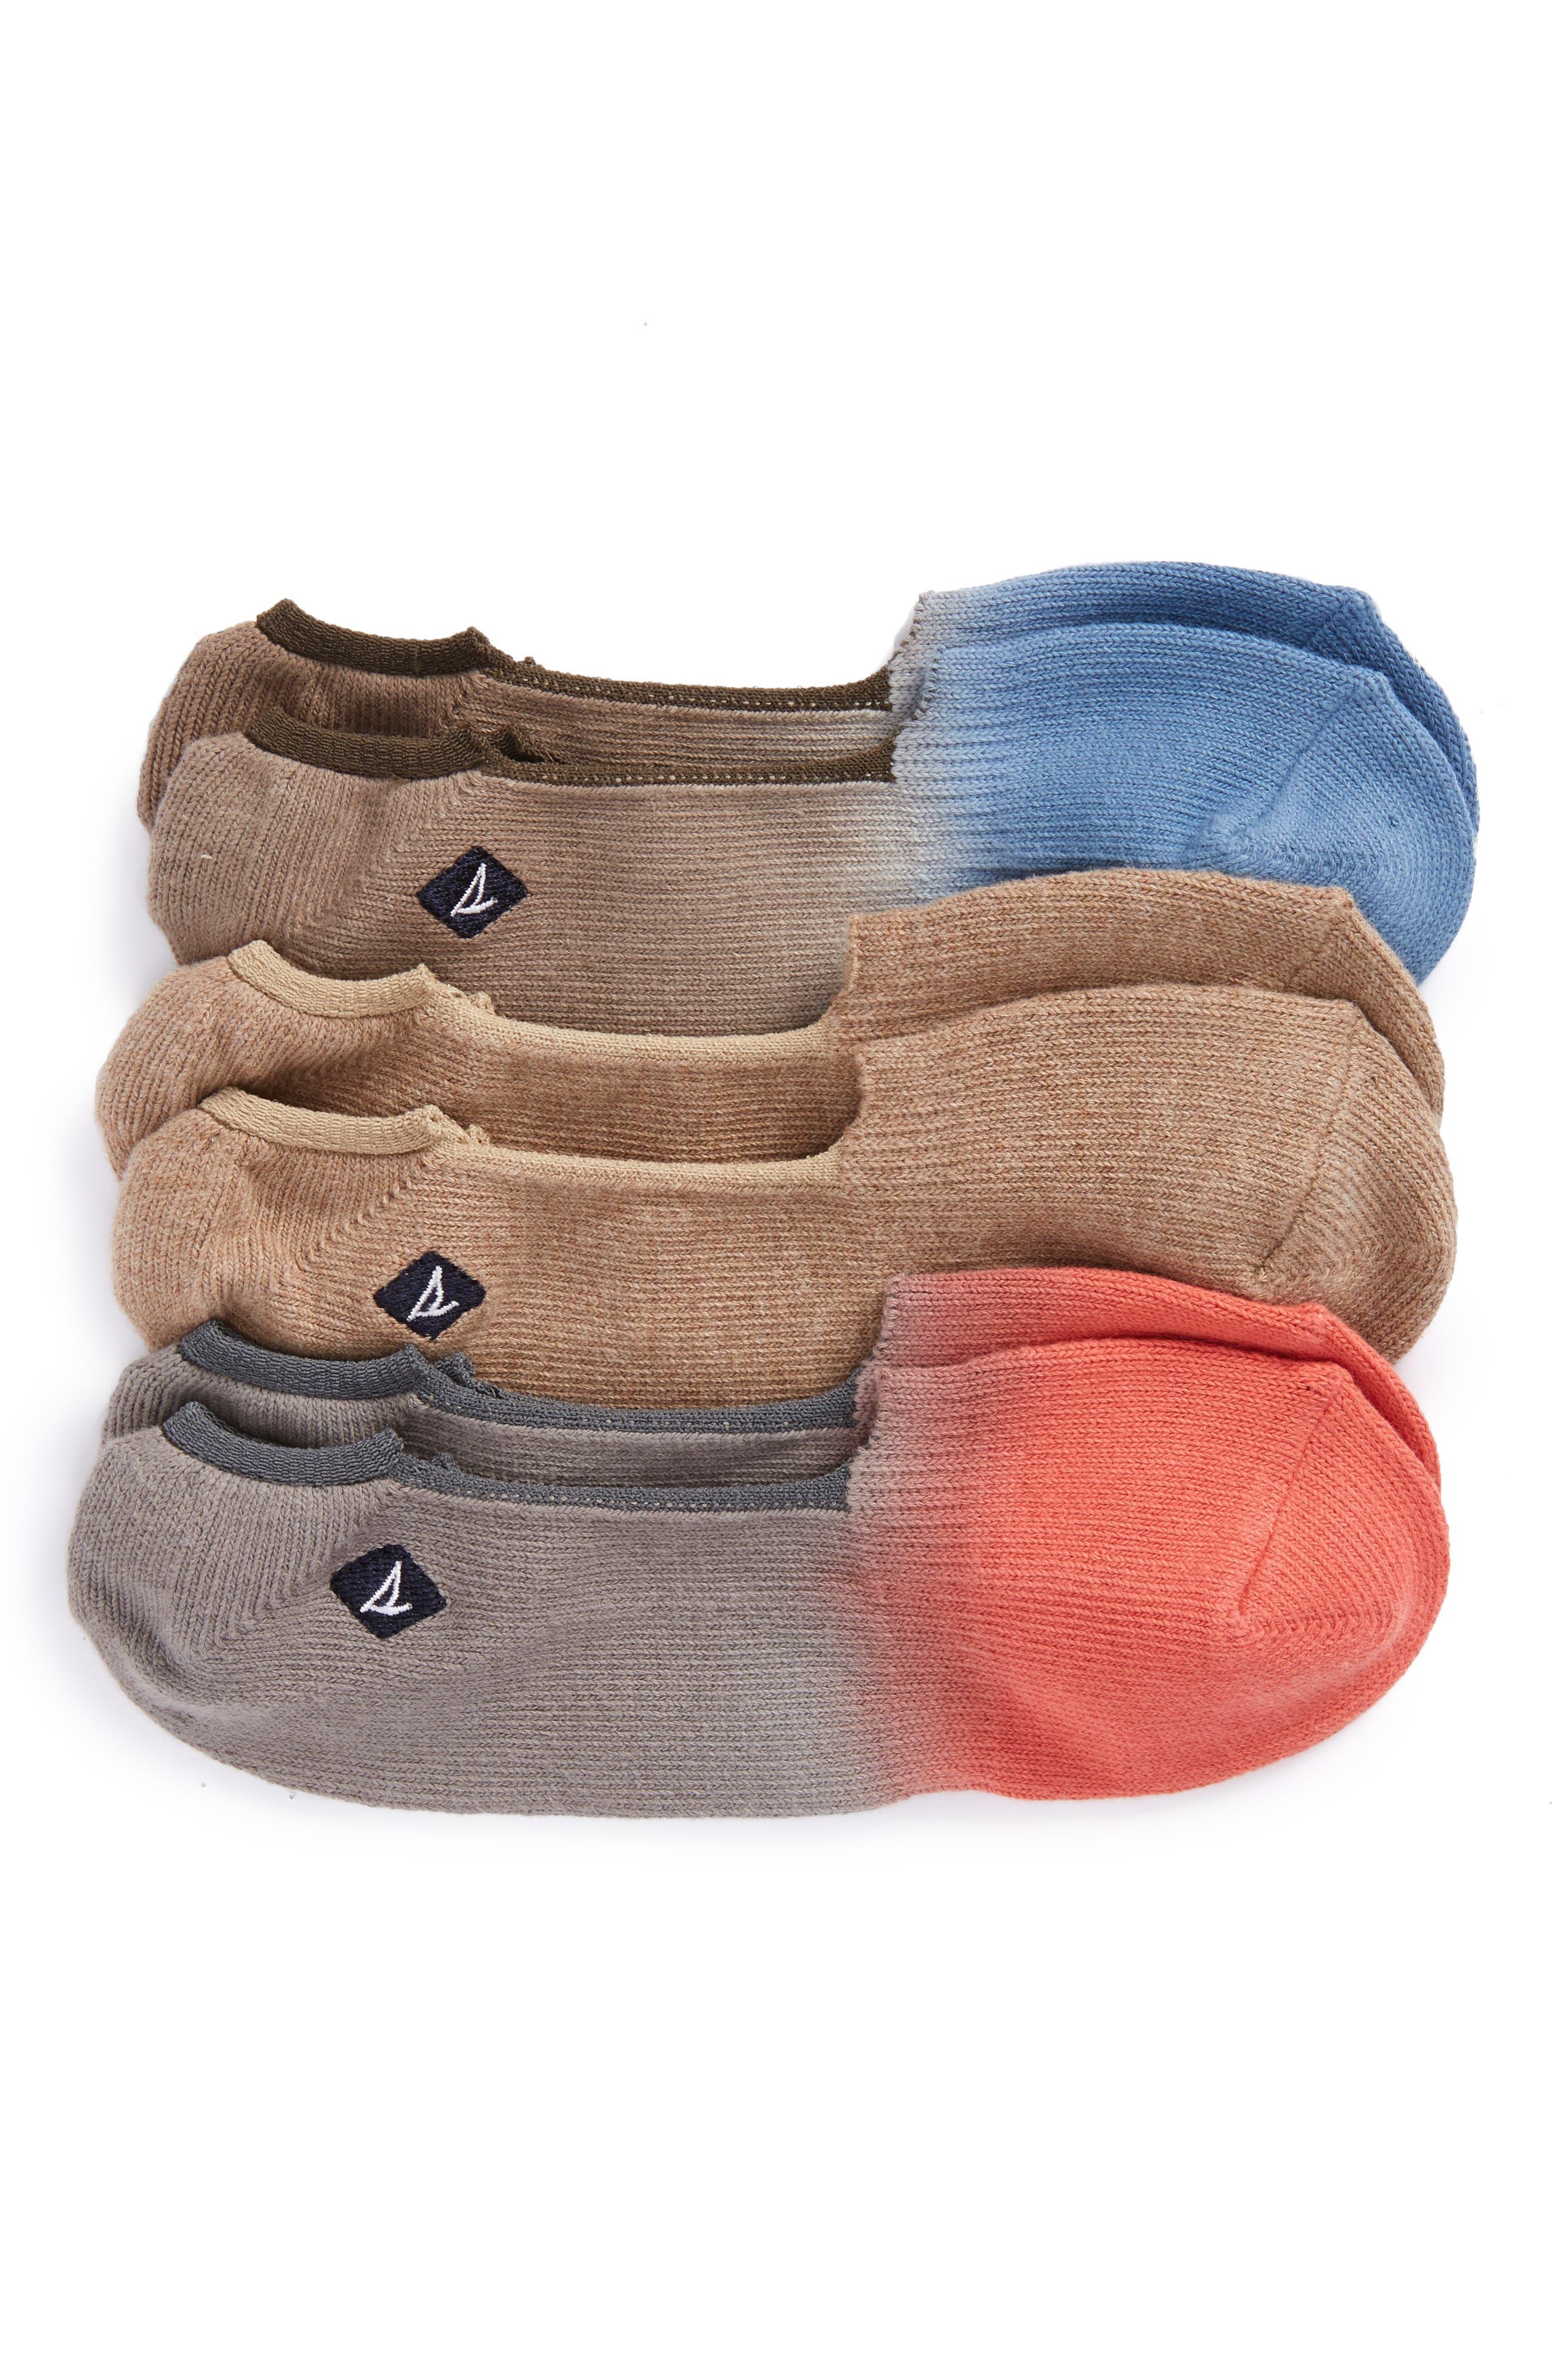 3-Pack Liner Socks,                         Main,                         color,